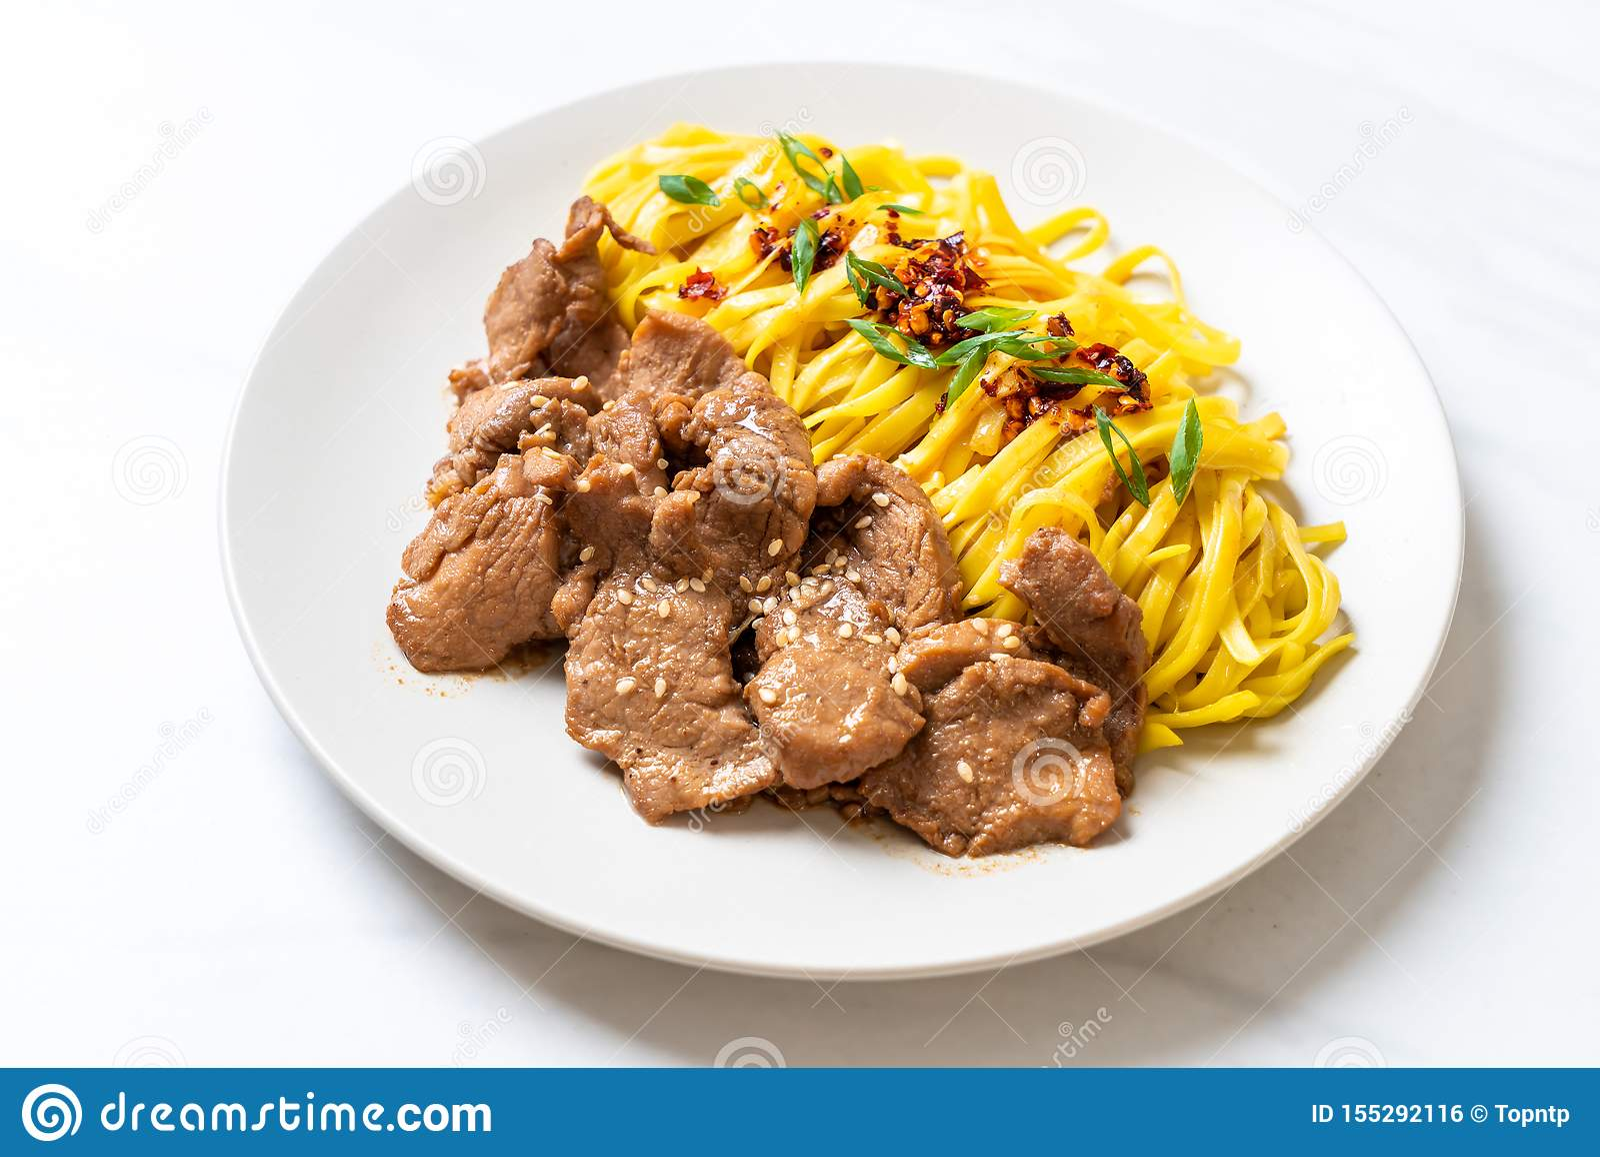 asian stir-fried noodle with pork